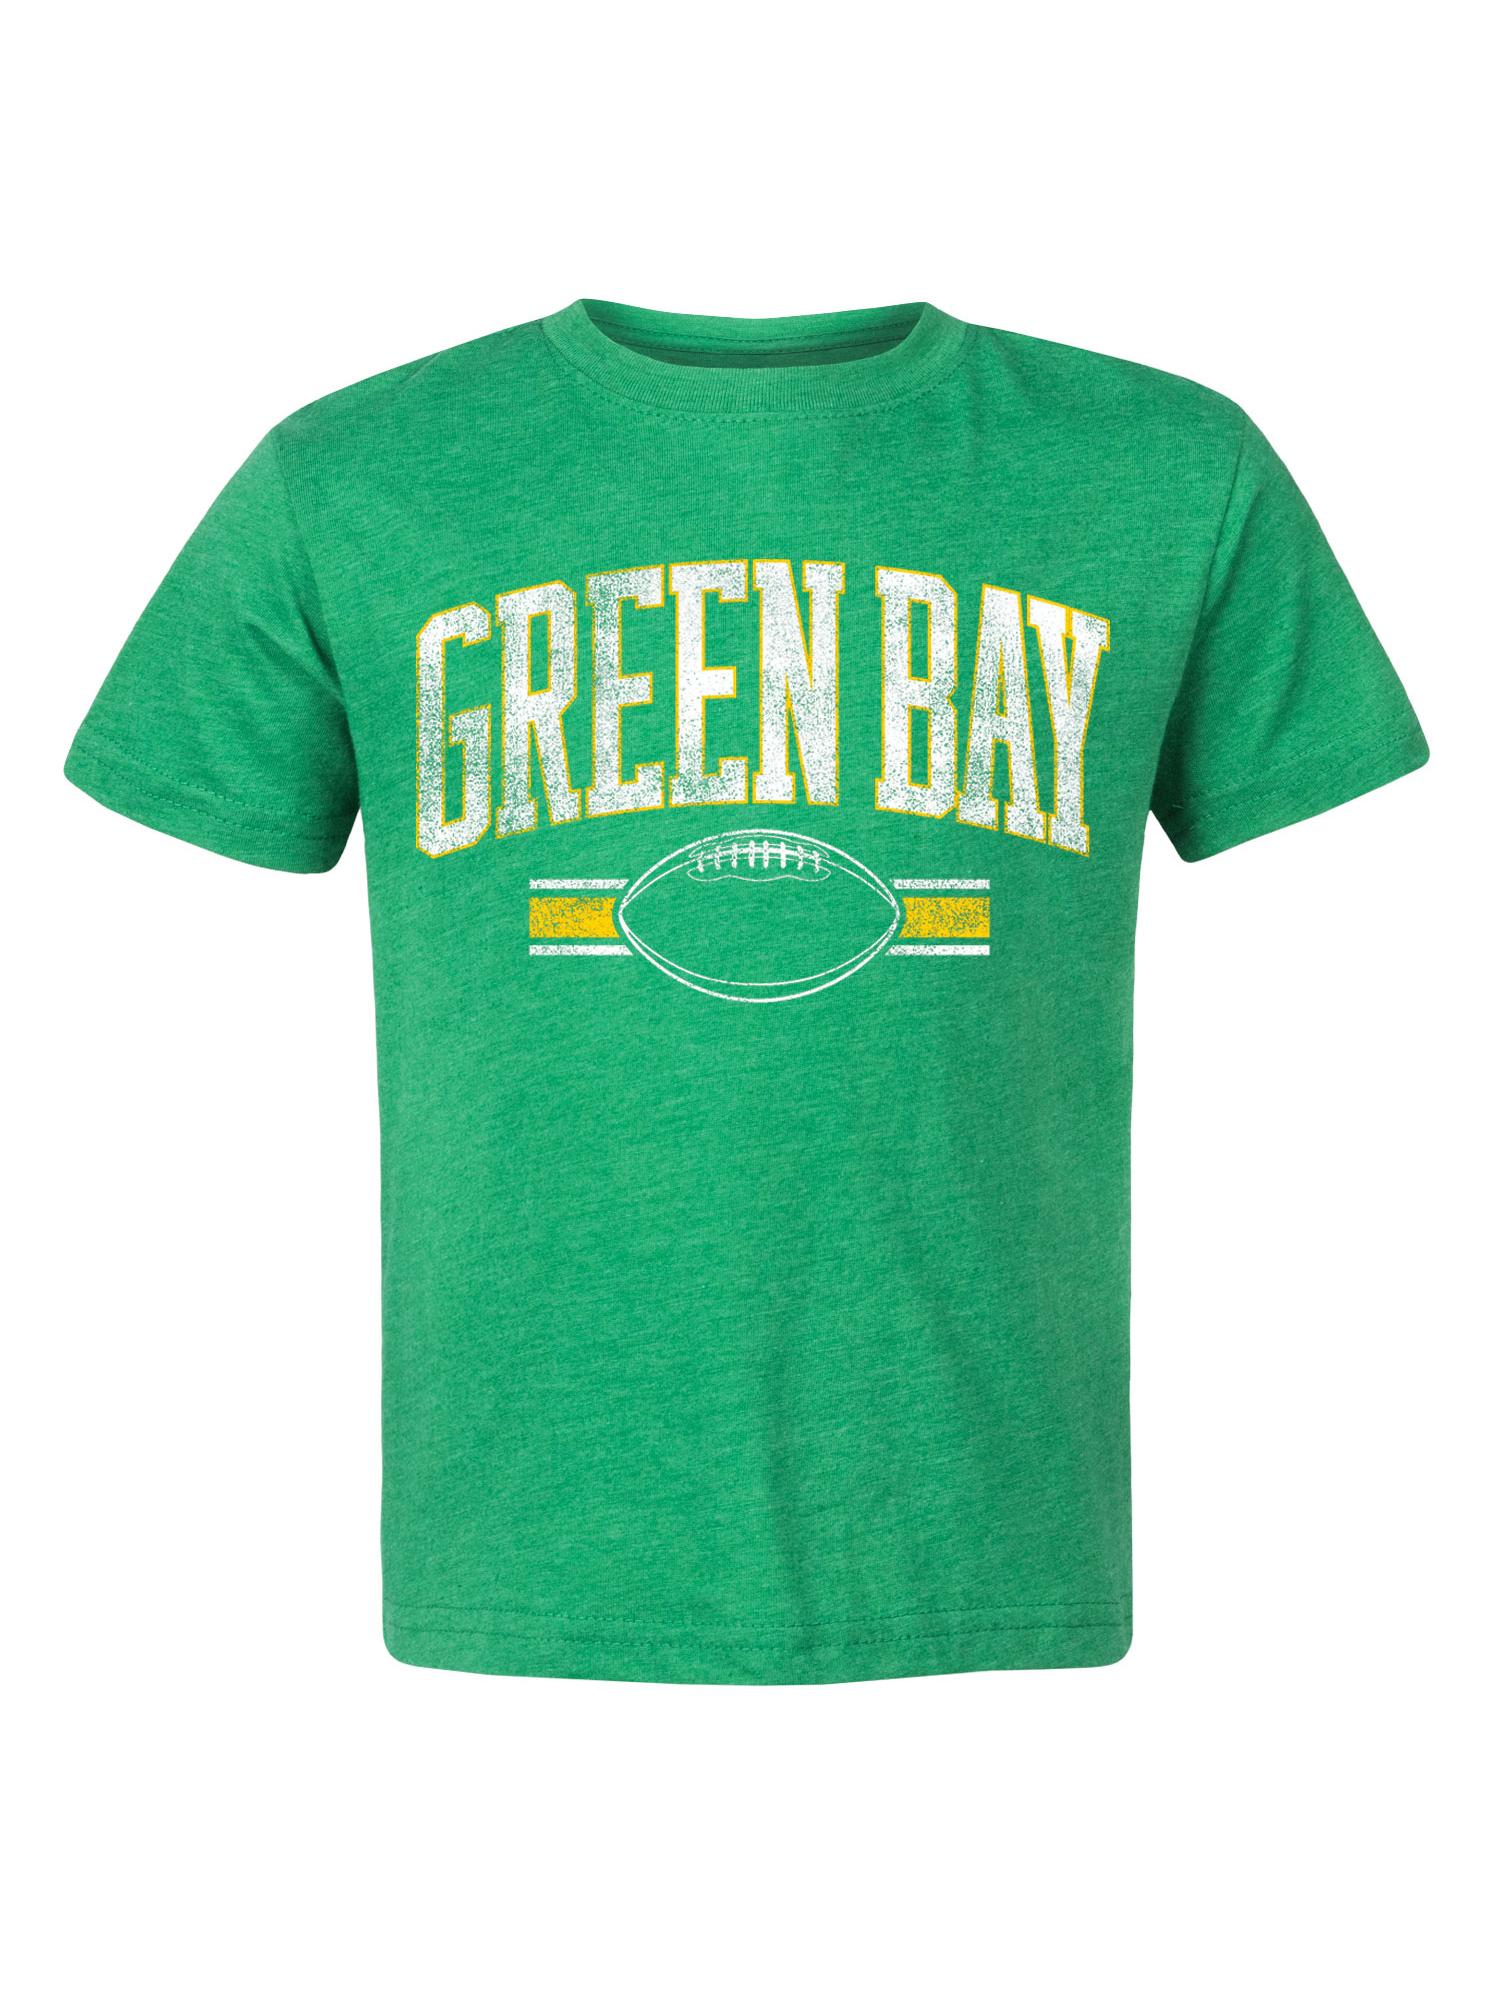 Boys Green Bay Football Fan Distressed Cotton Graphic Tee Shirt